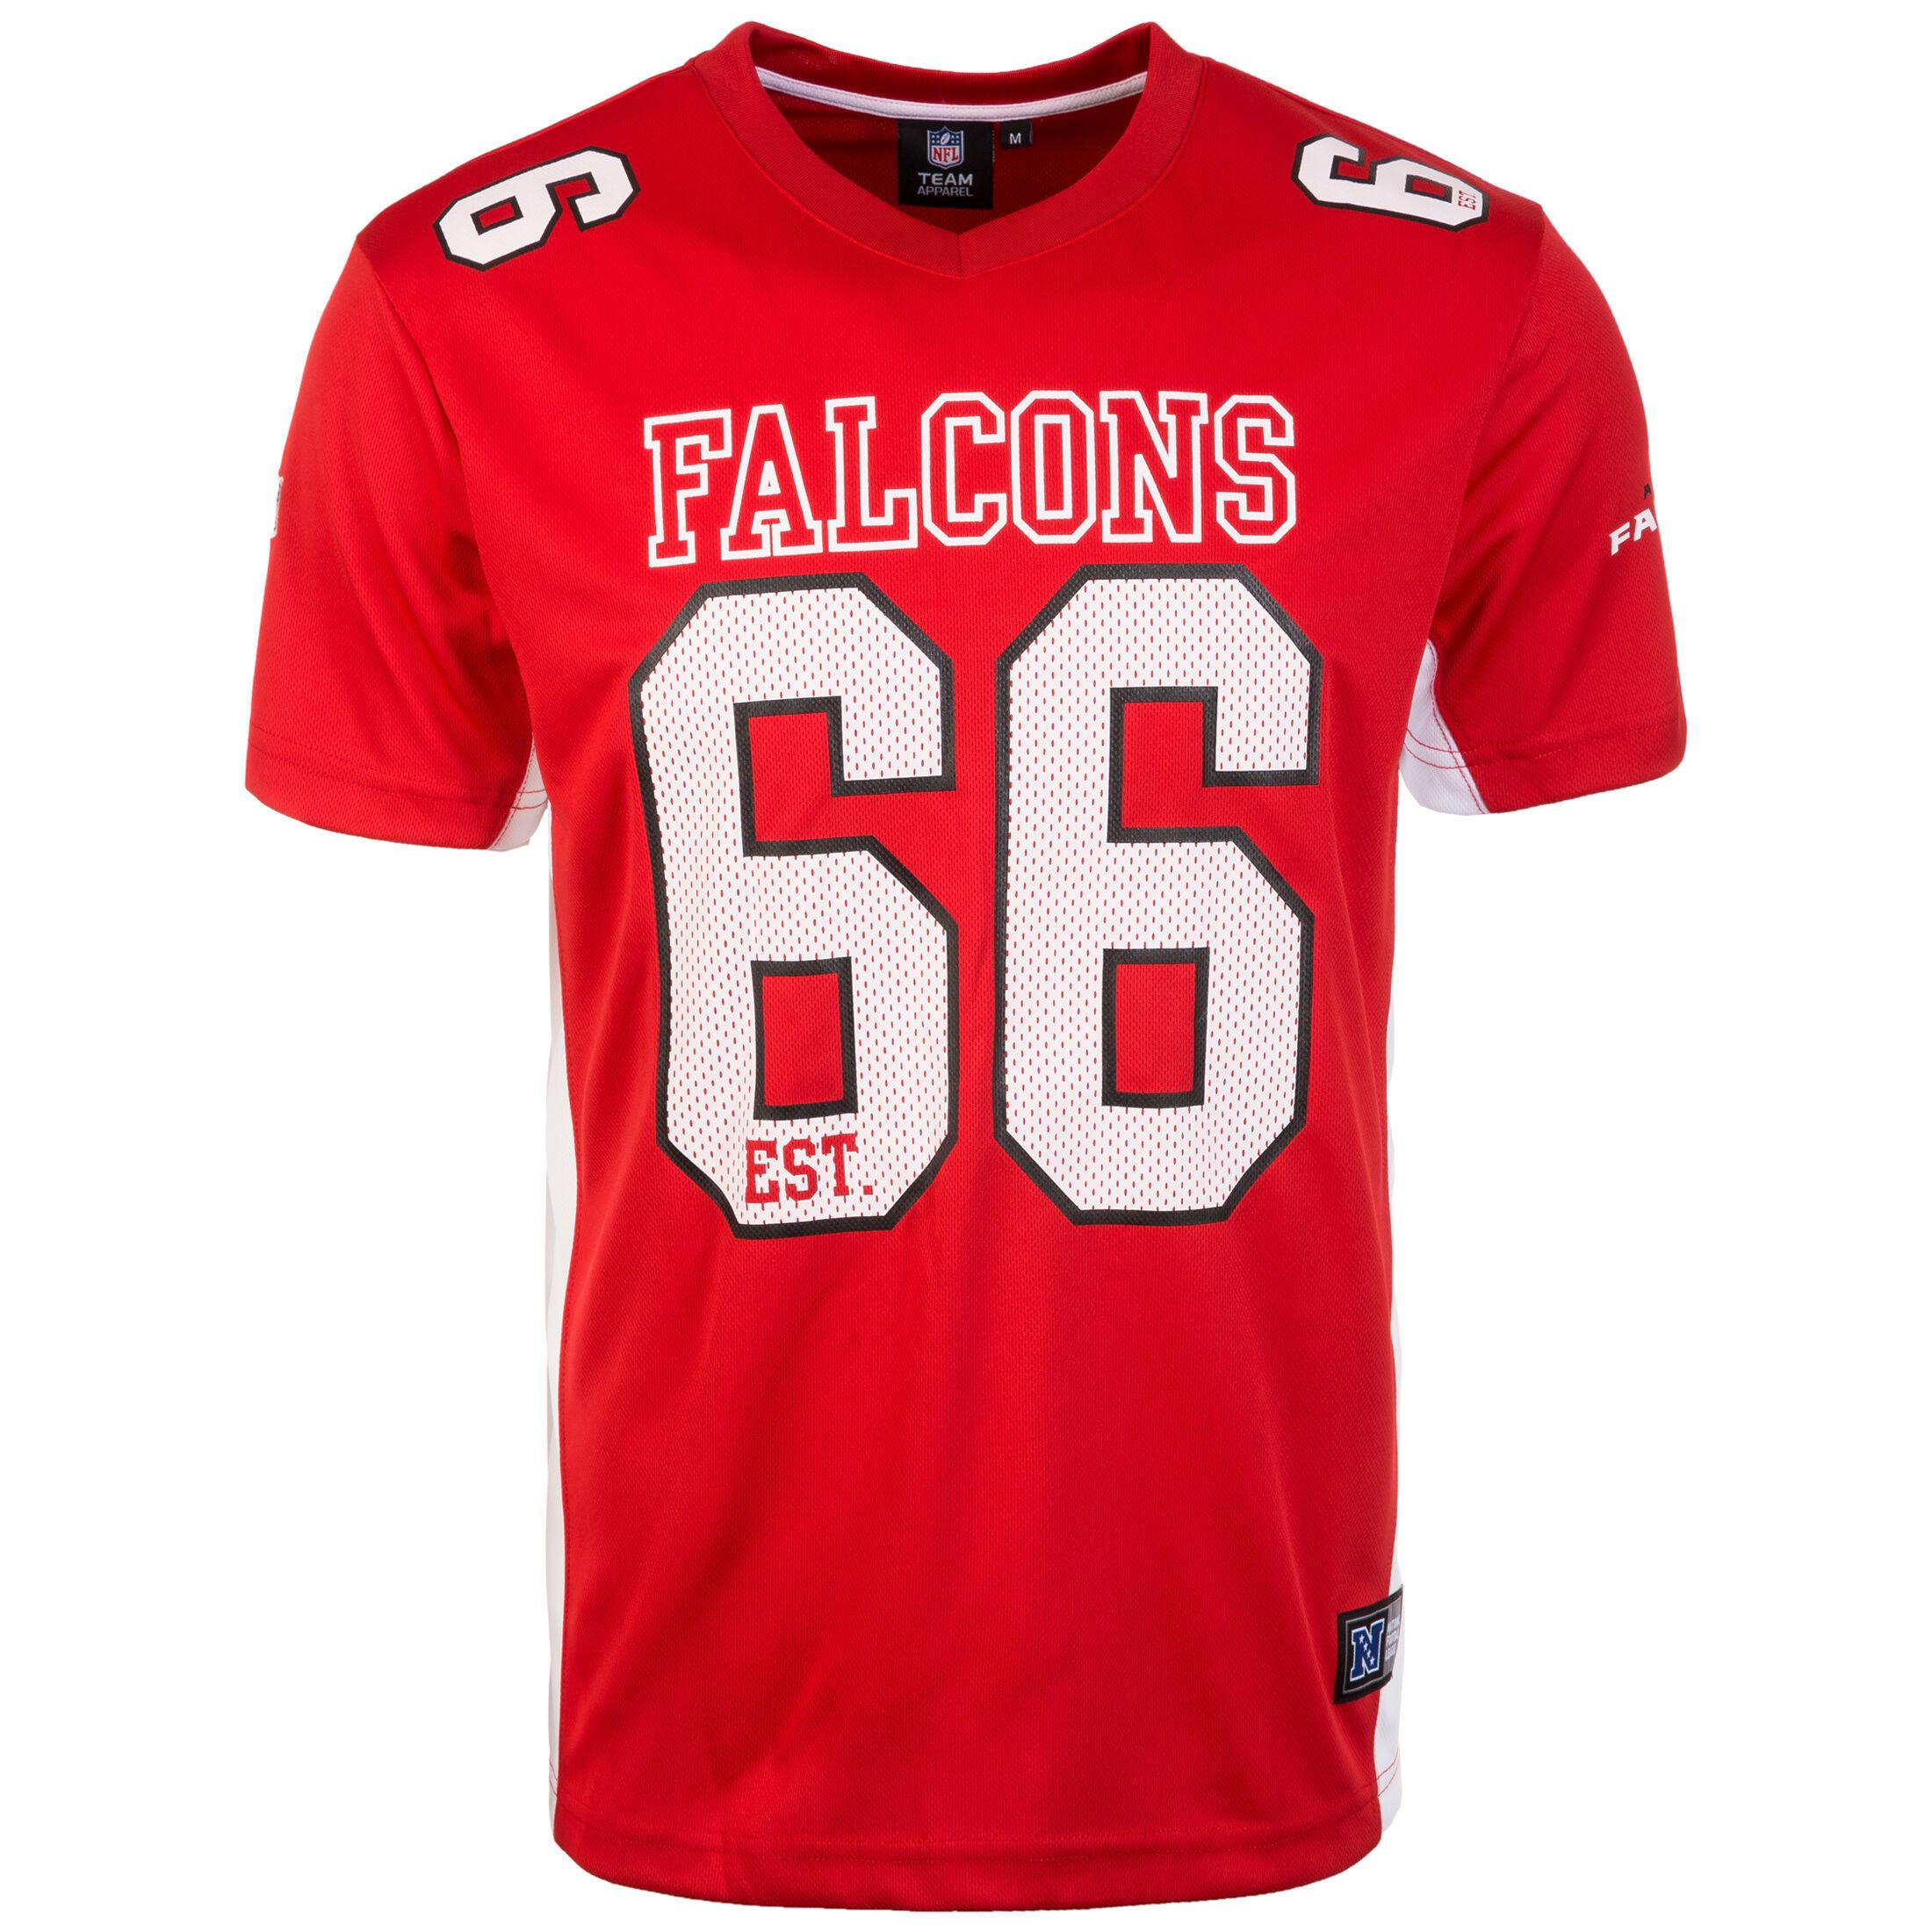 Atlanta Falcons #11 Jones NFL Polymesh Jersey Shirt